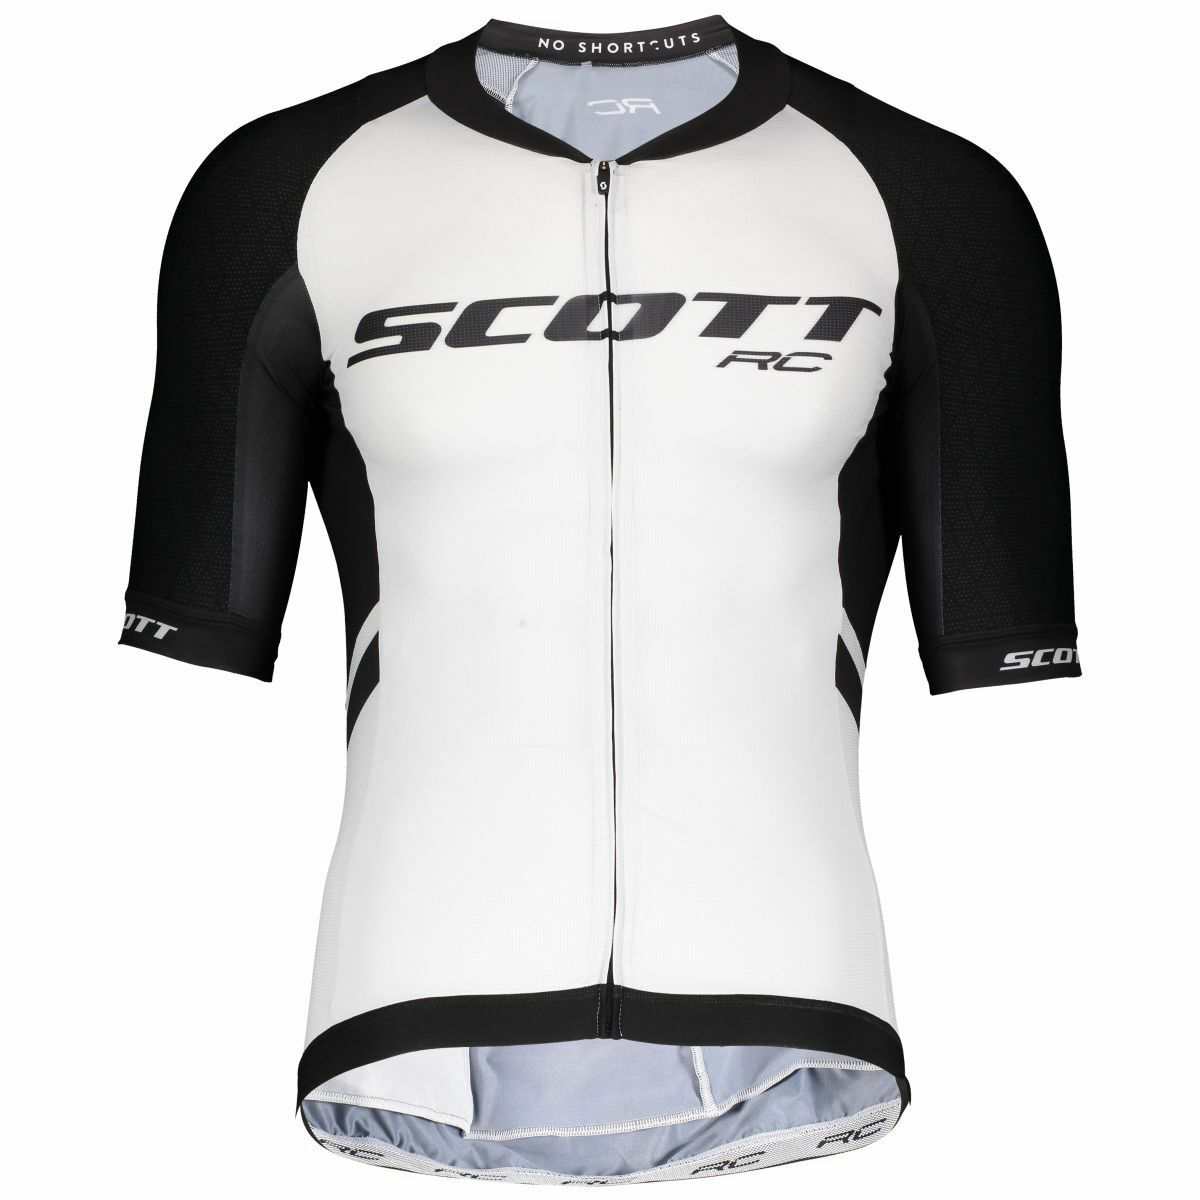 Scott RC premium ITD bicicleta camiseta corto blancoo negro 2019